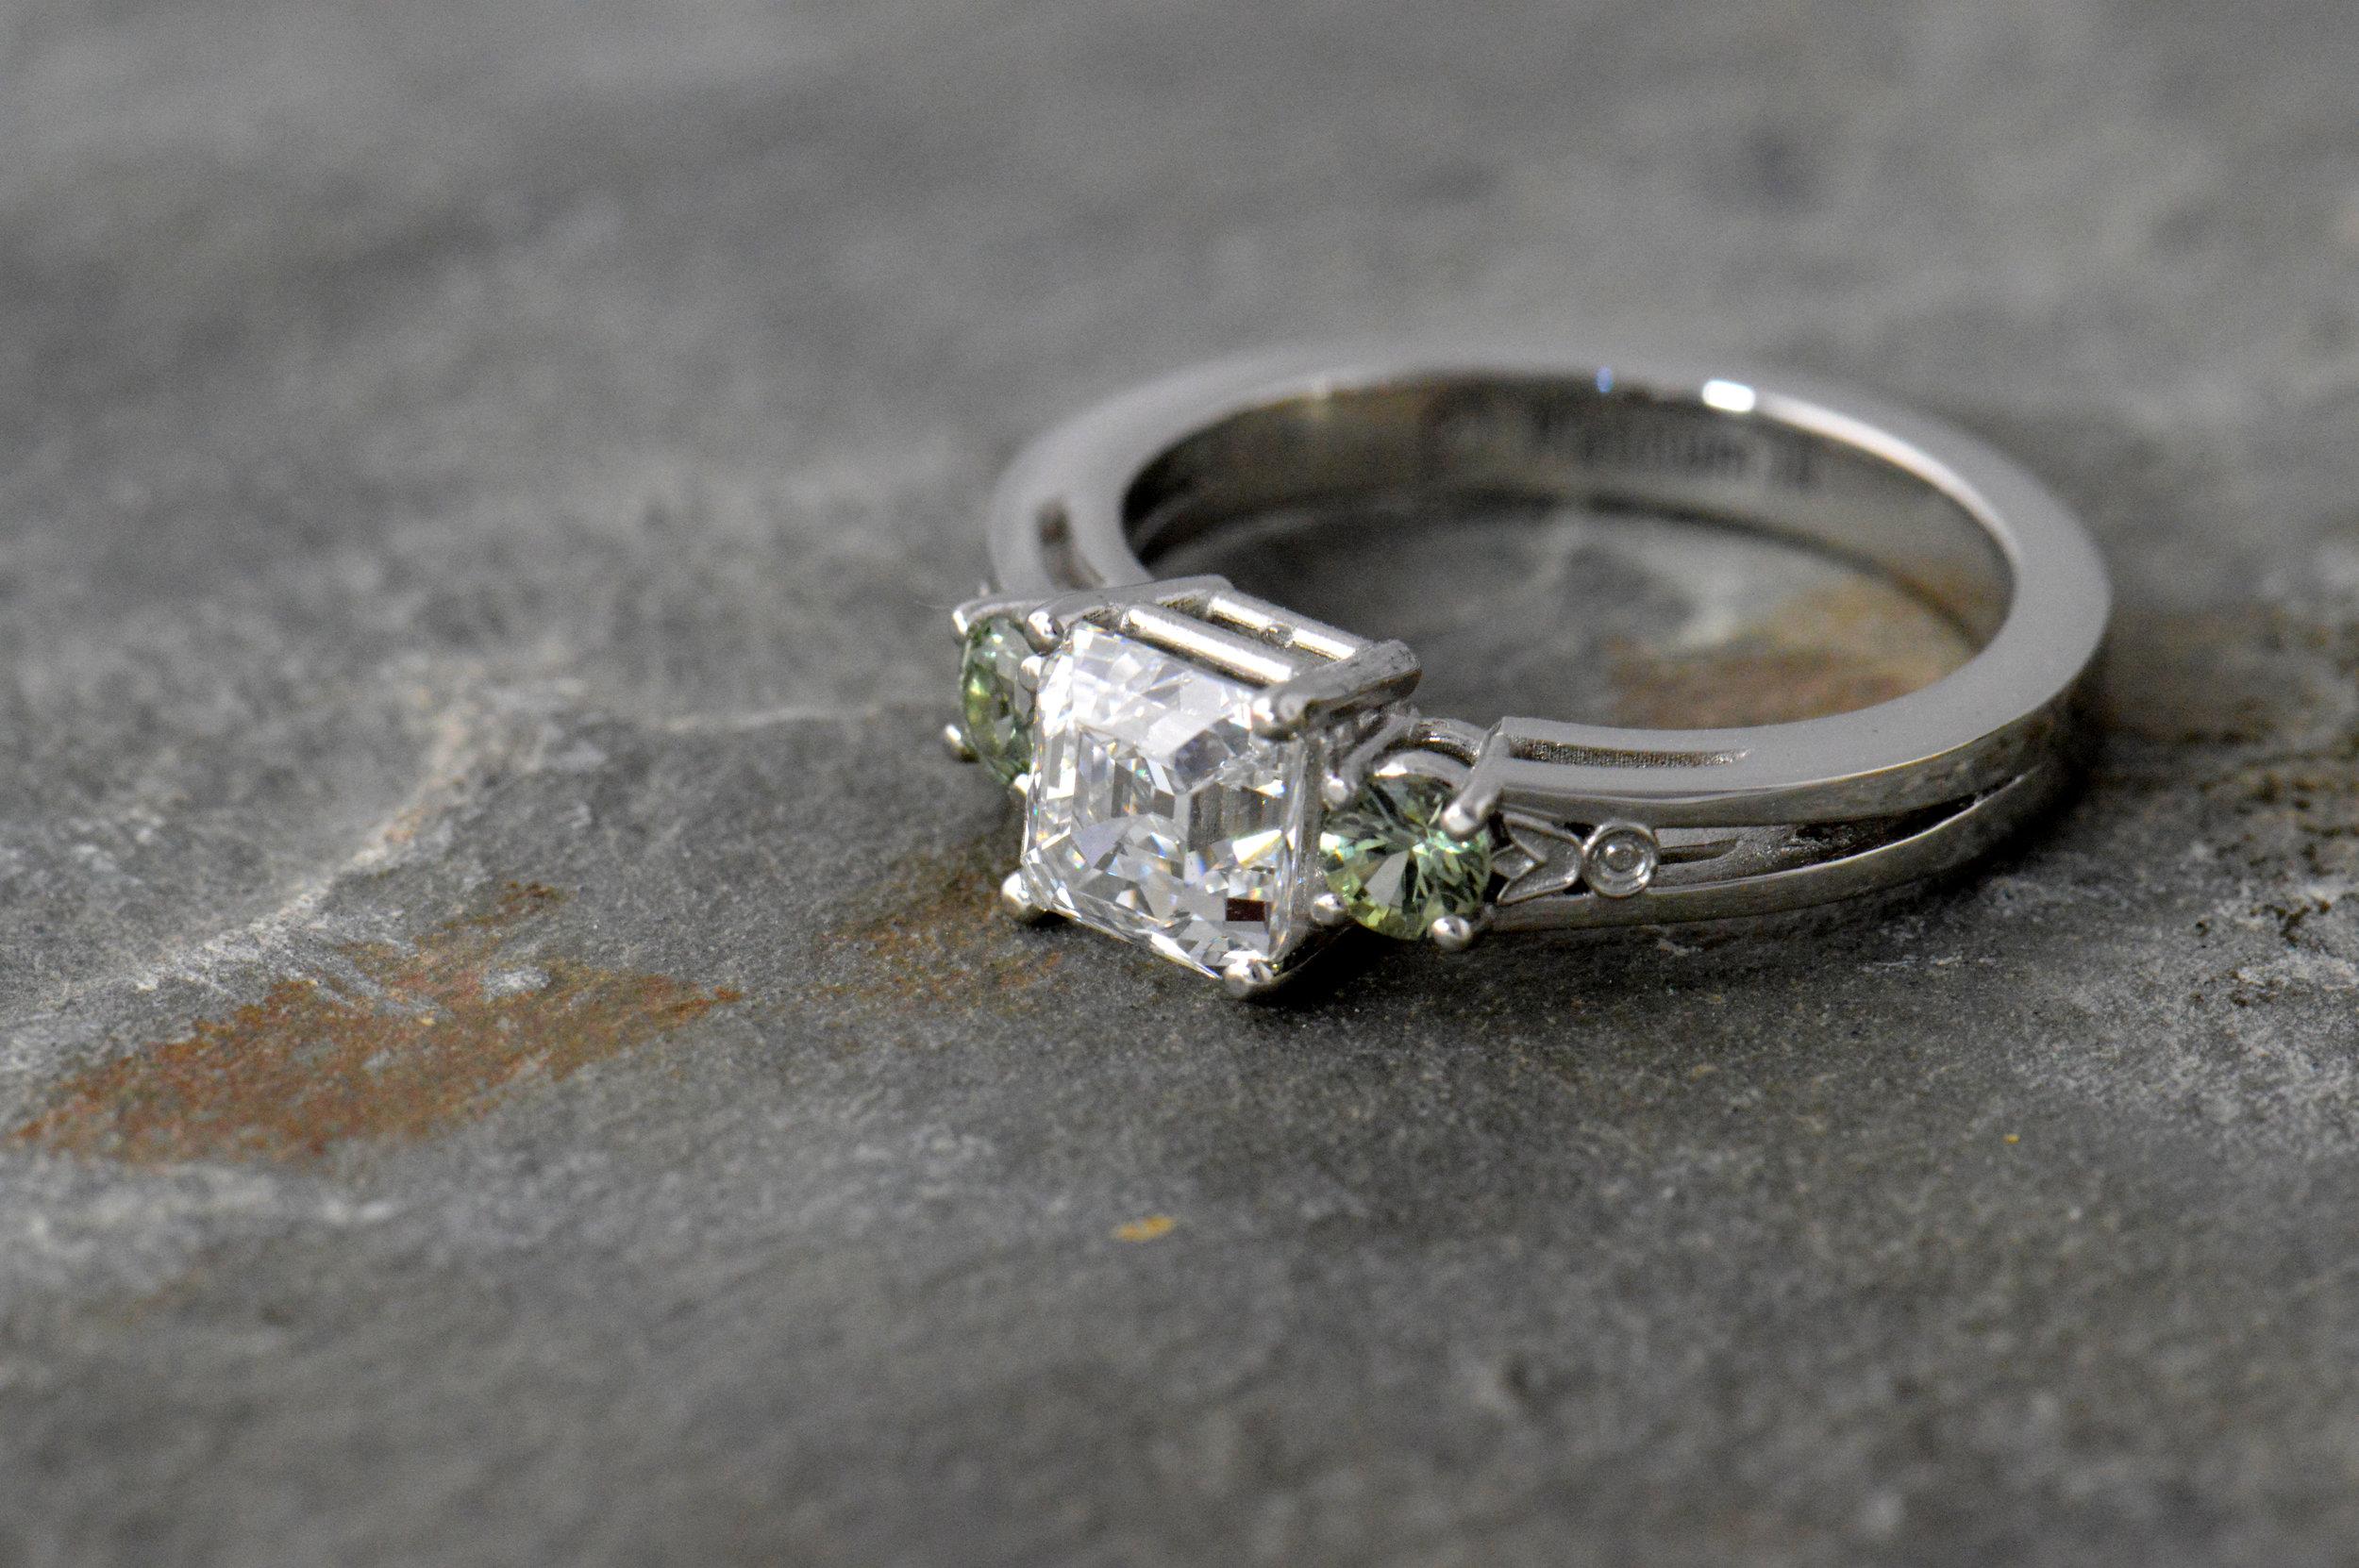 darvier-green-sapphire-asher-diamond-platinum-art-deco-ring.JPG